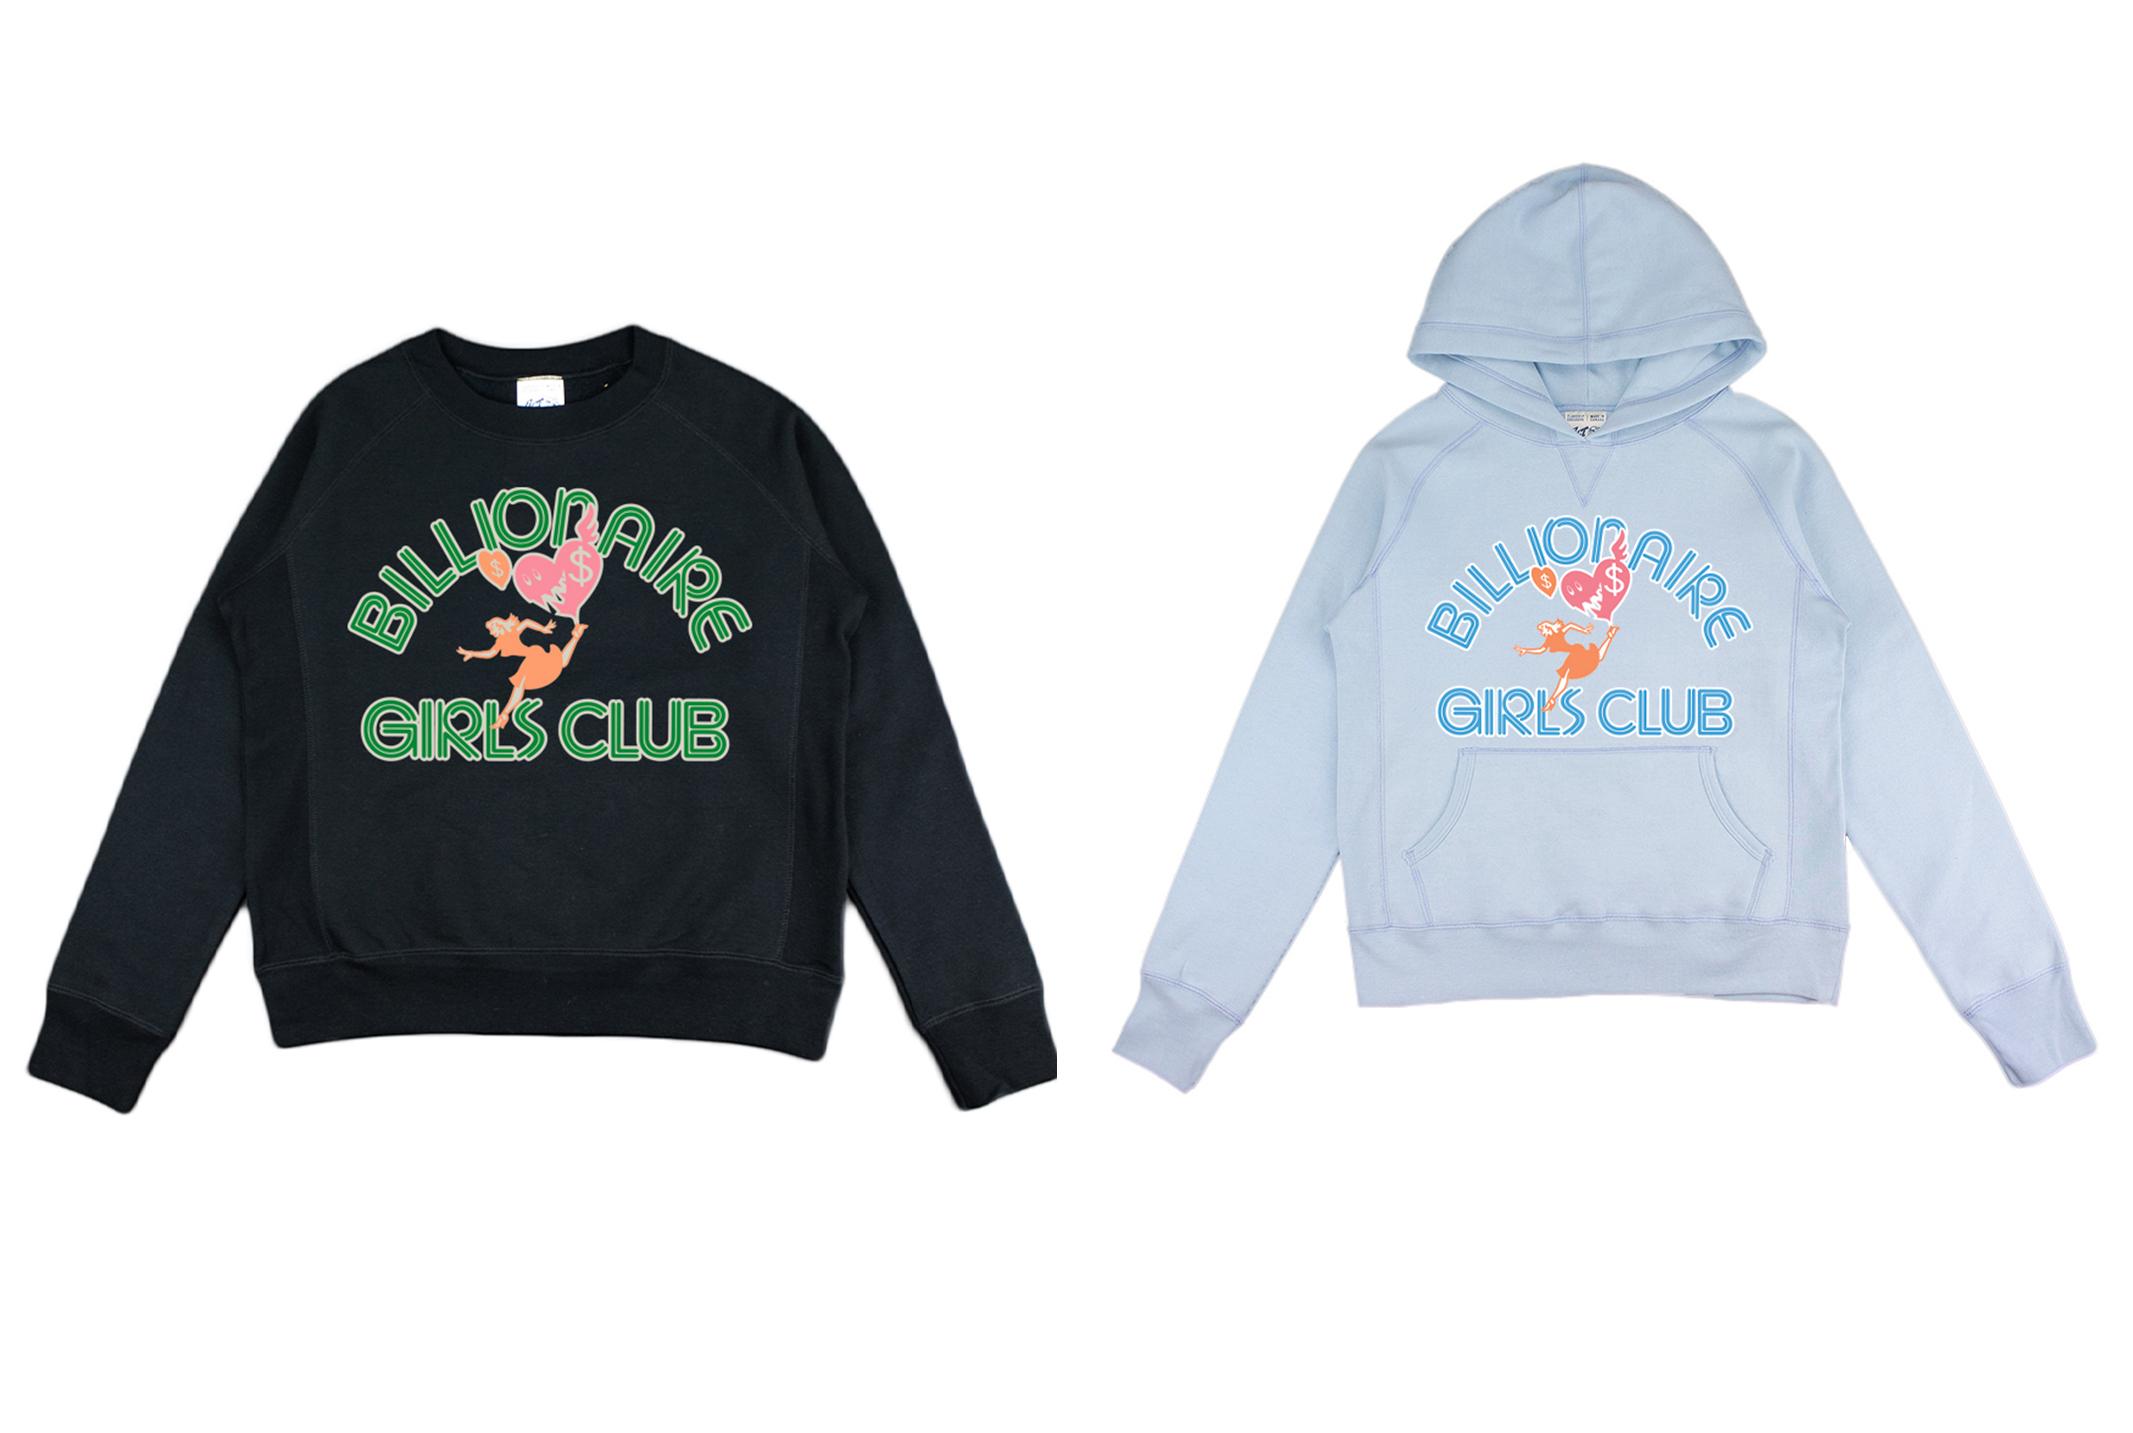 Billionaire Girls Club